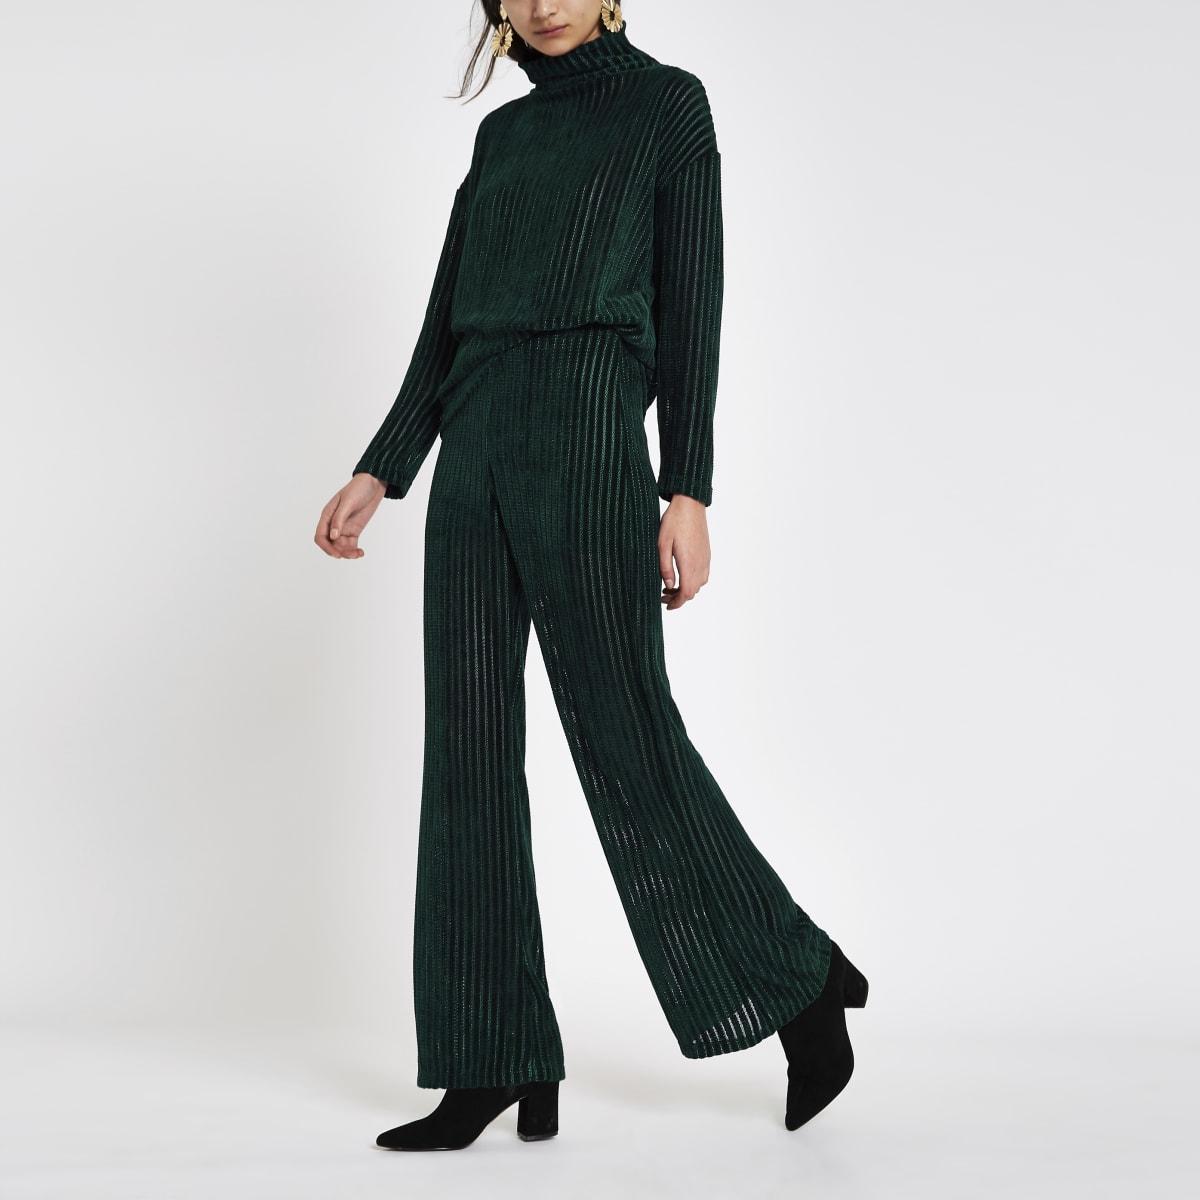 Dark green pull on wide leg trousers